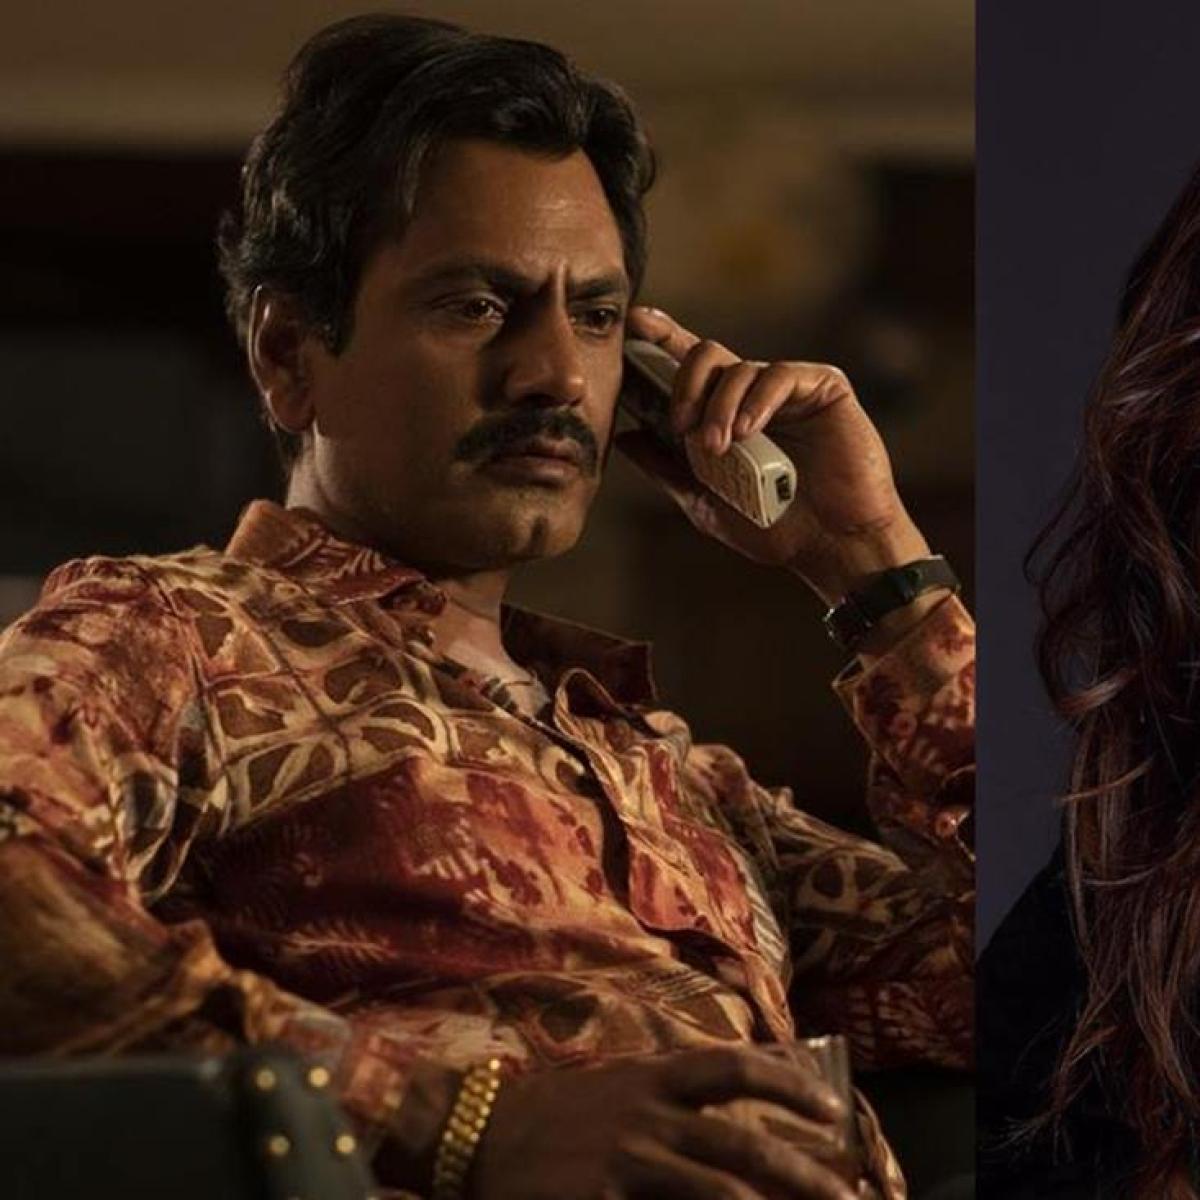 Nawazuddin Siddiqui to reunite with 'Sacred Games' co-star Elnaaz Norouzi for upcoming film 'Sangeen'